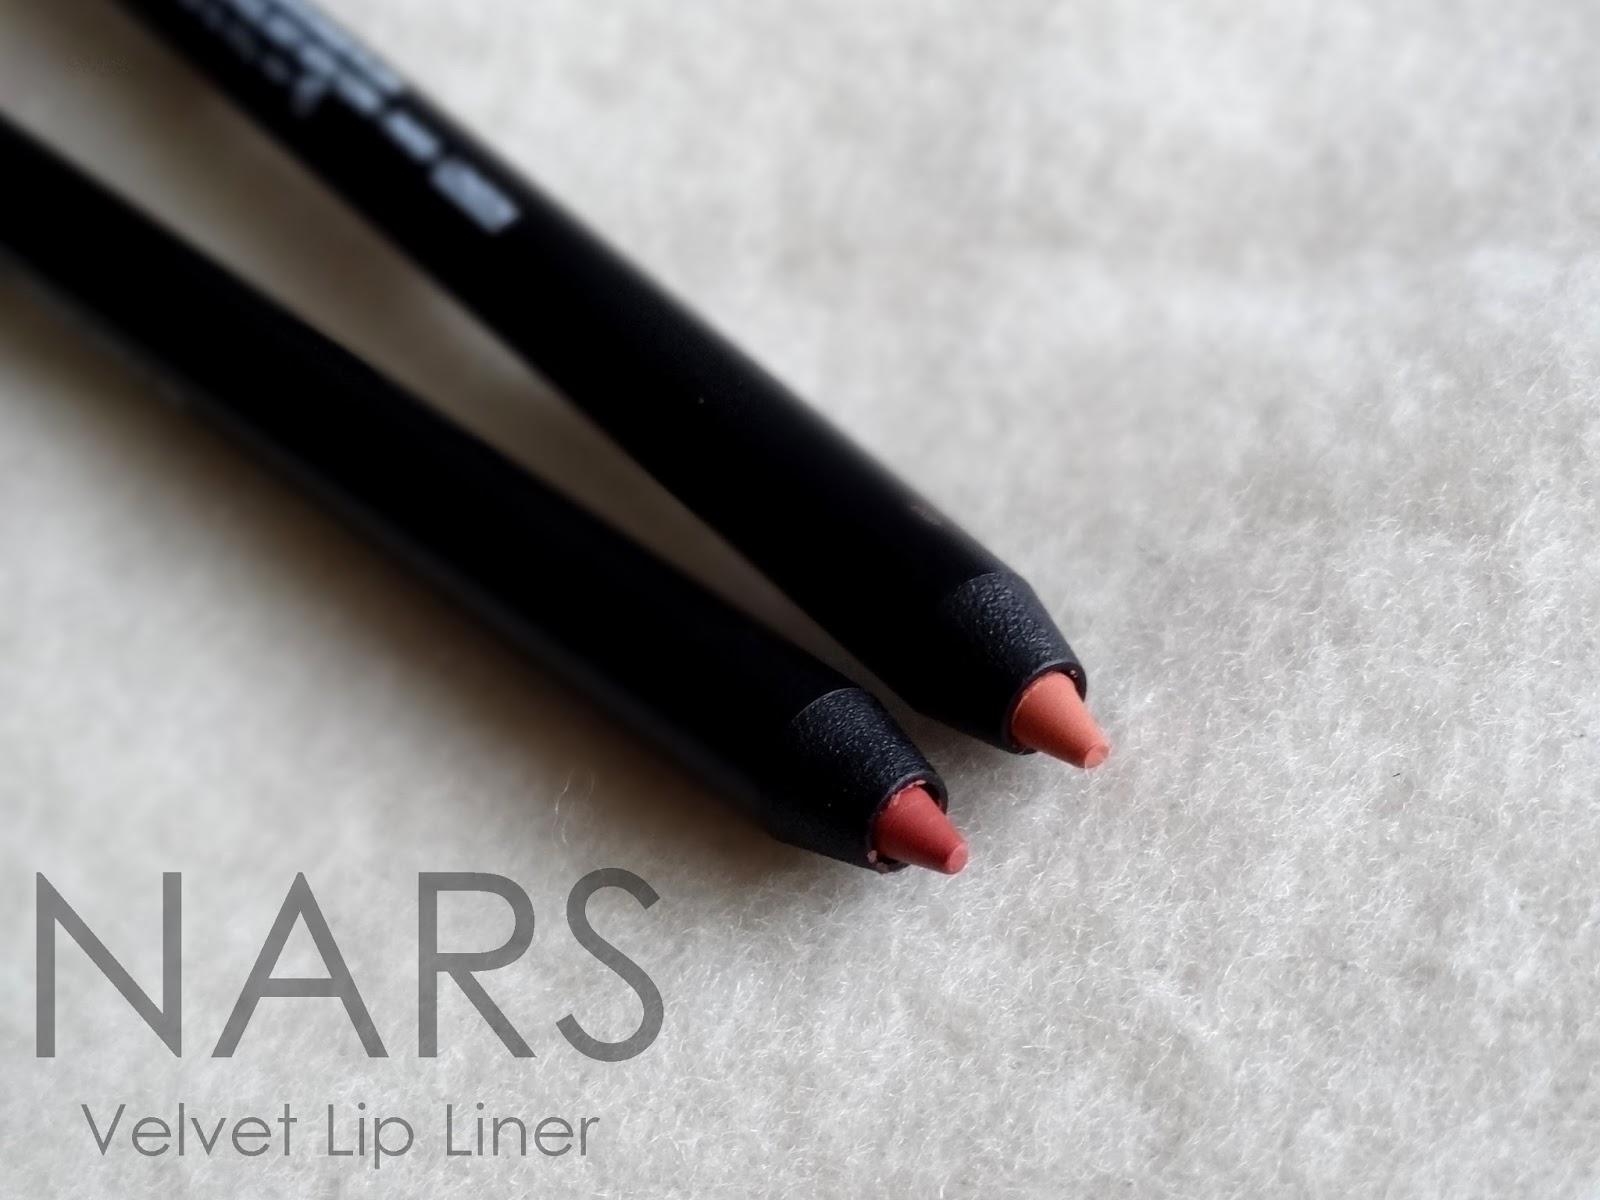 NARS Velvet Lip Liners Waimea and Patong Beach